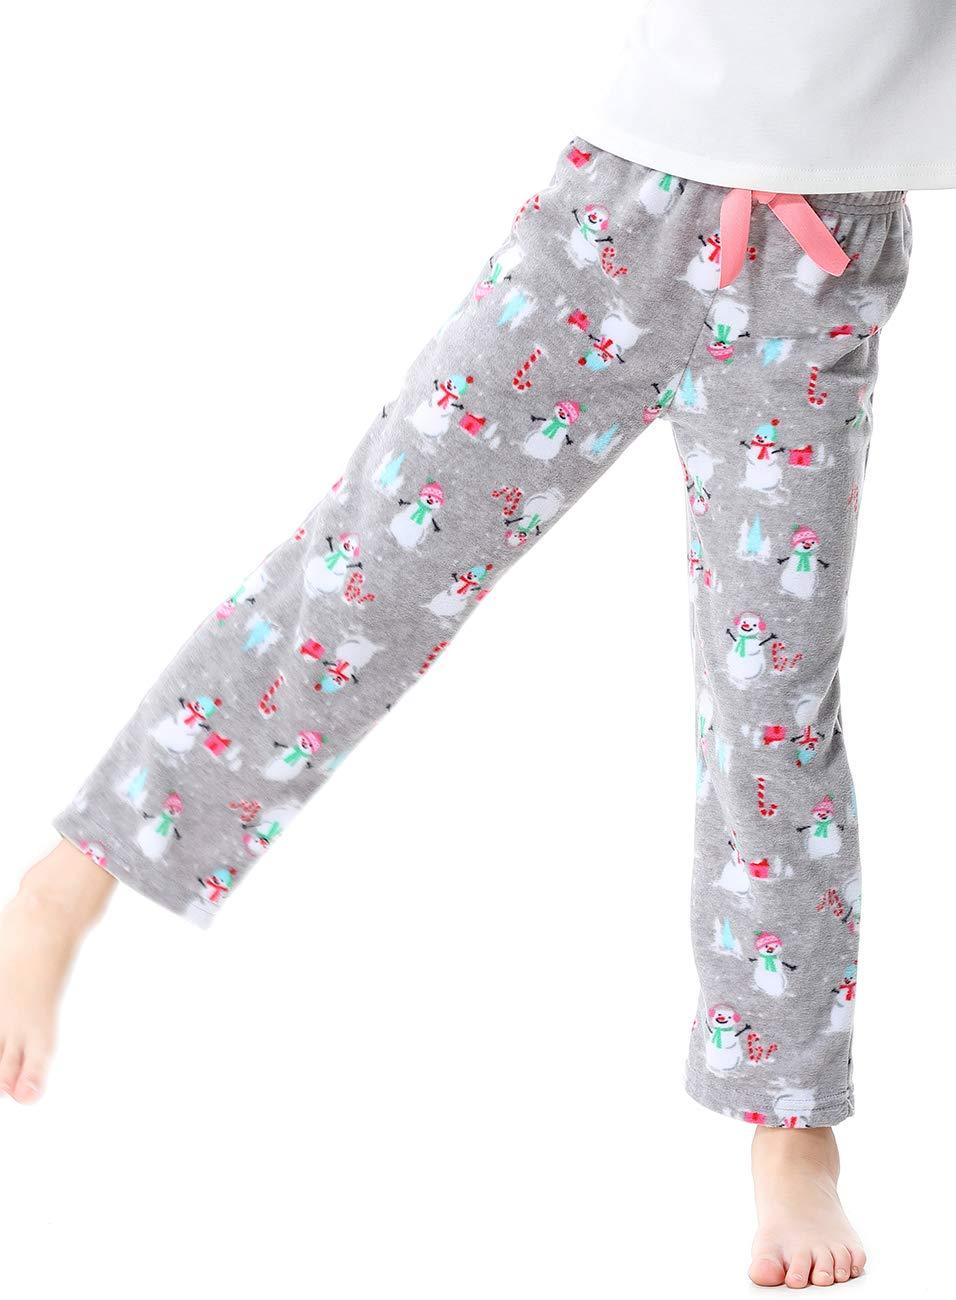 Image of Cute Fleece Snowman Pajama Pants for Girls